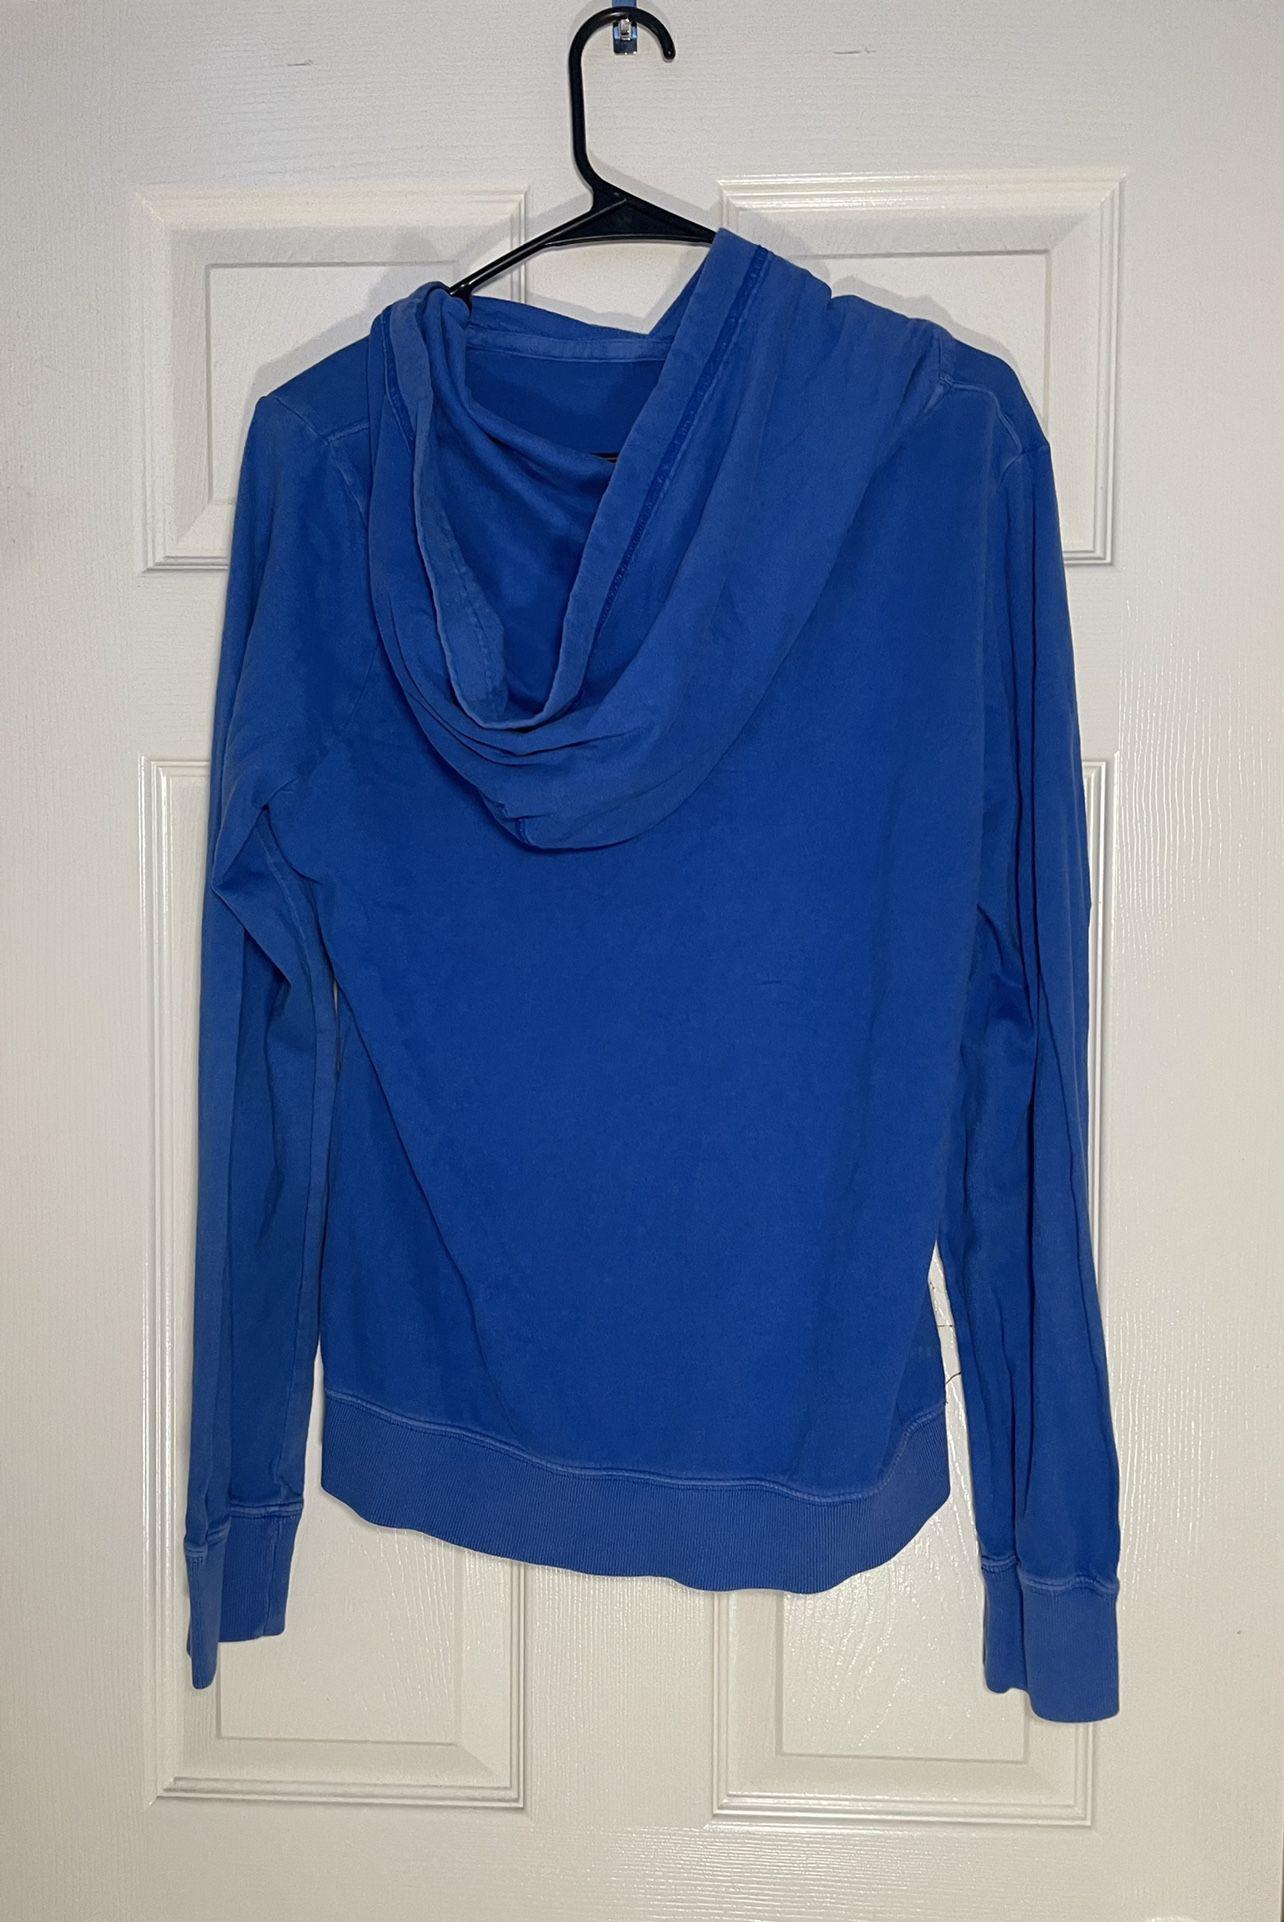 Hollister Blue Hoodie/TShirt Size Large